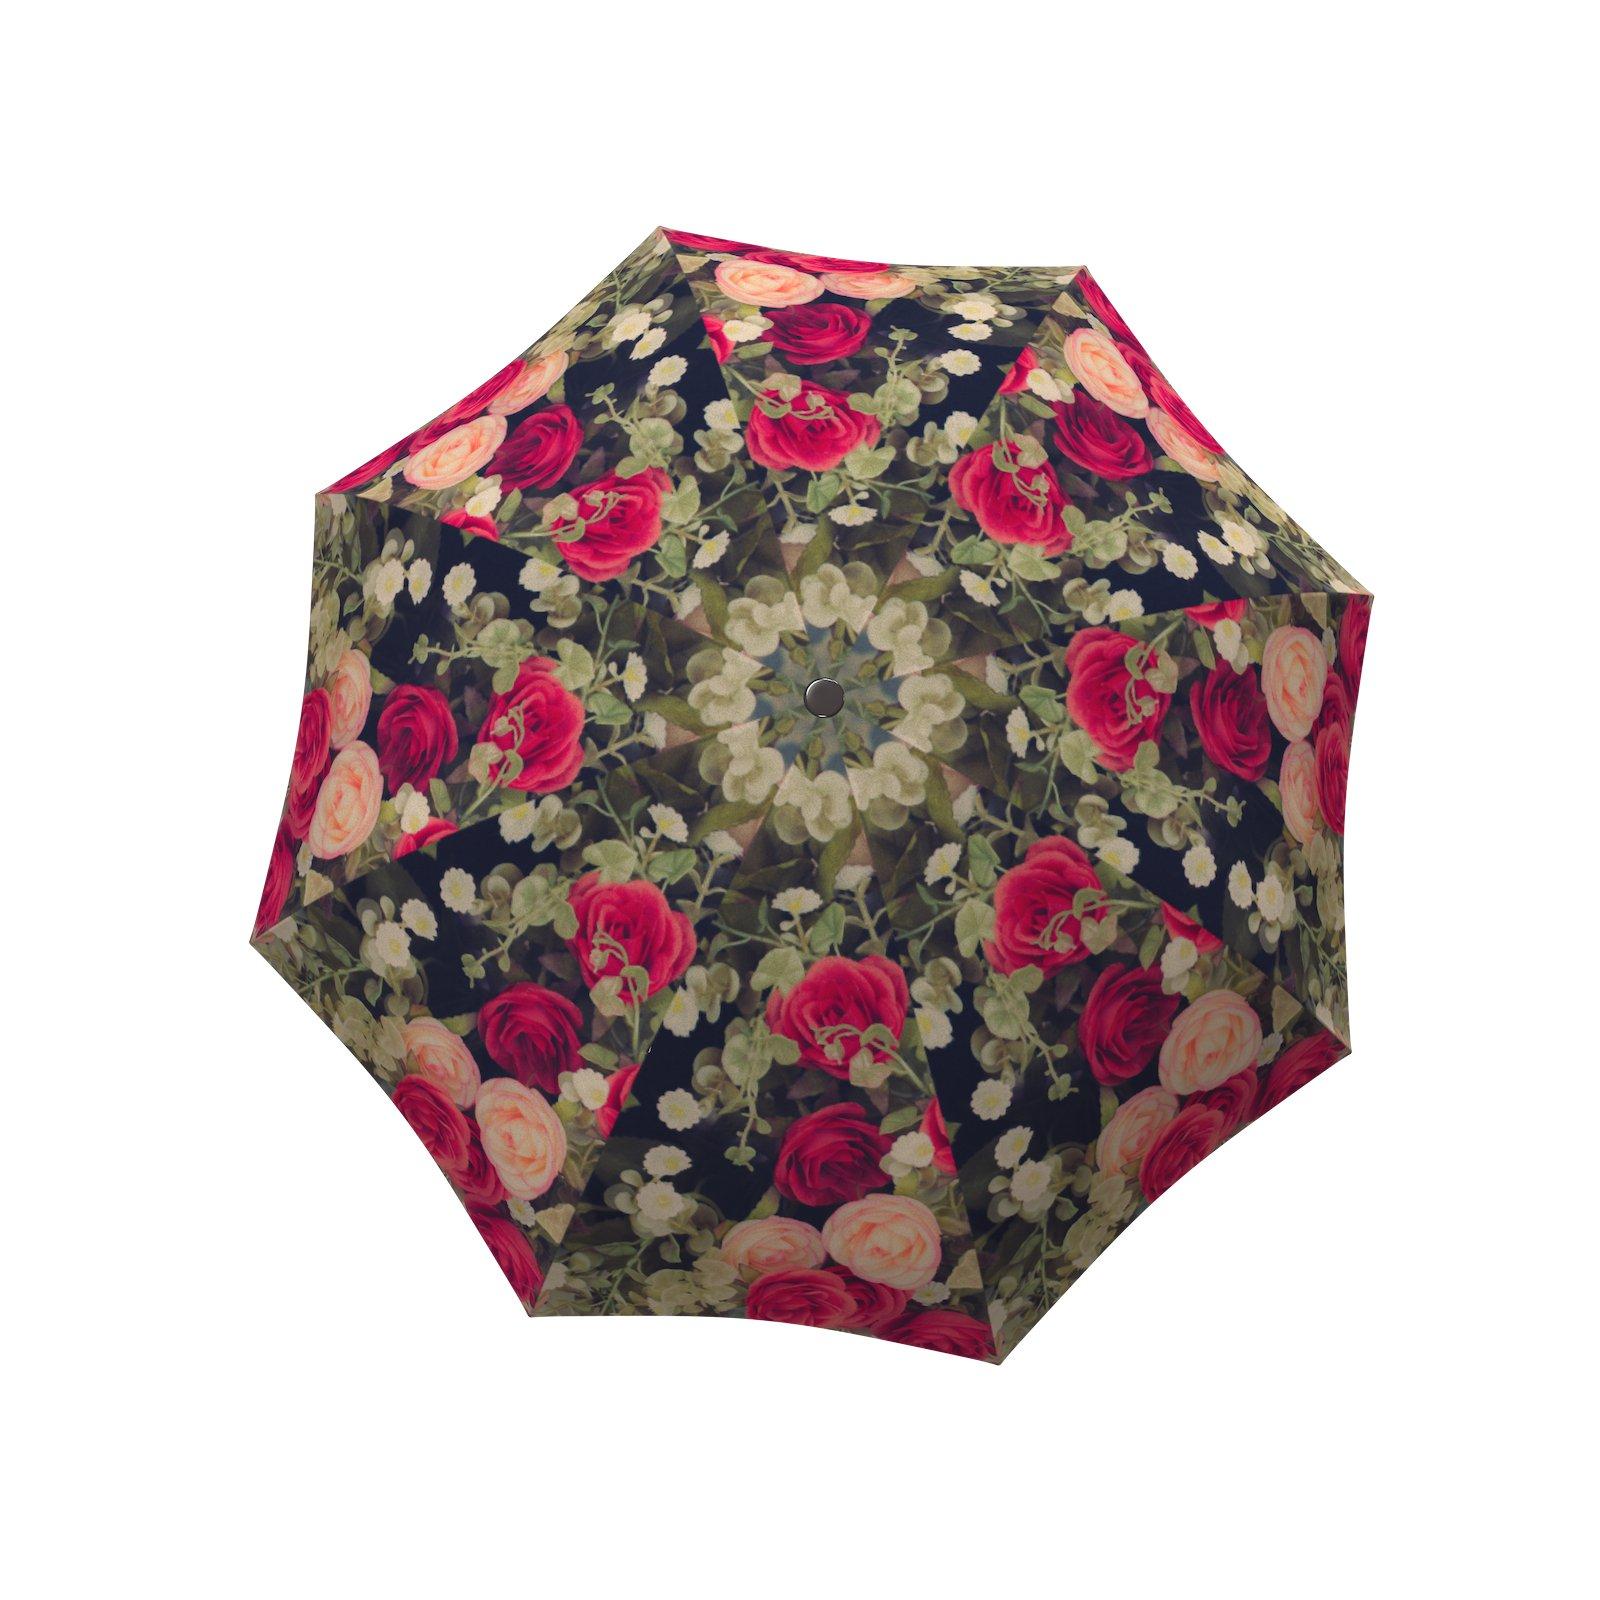 LA BELLA UMBRELLA Vintage Roses Designer Large Canopy Unique Colourful Art Fashion Umbrella - Windproof Stick Straight